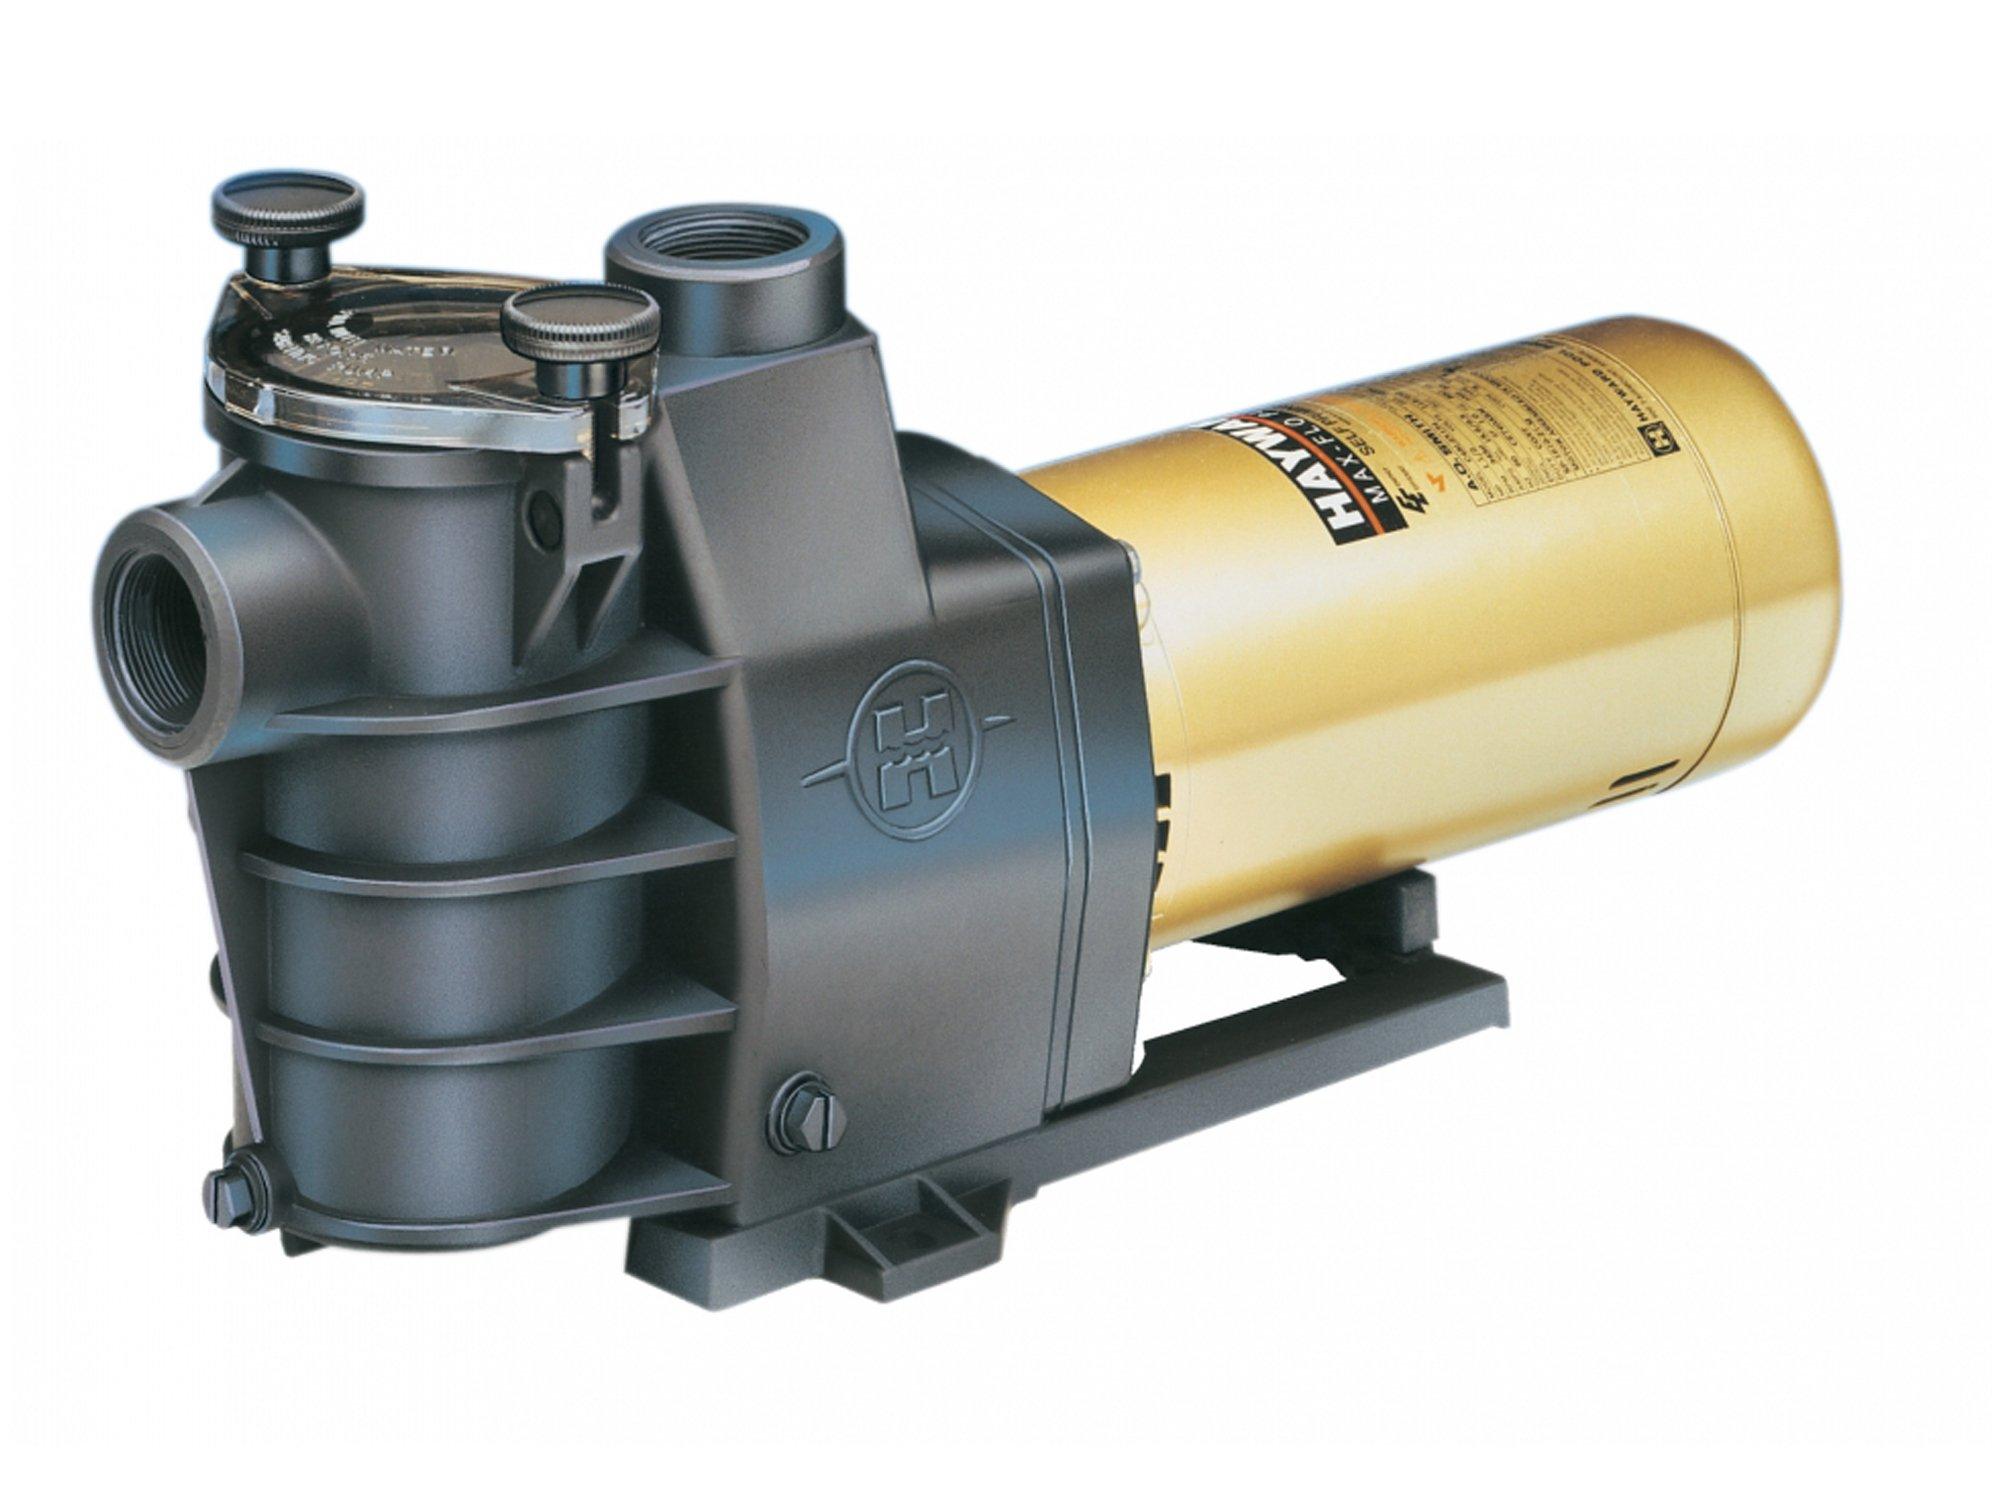 Hayward SP2805X7 3/4 HP Max-Flo Standard Efficient Single-Speed Medium Head In-Ground Pool and Spa Pump by Hayward